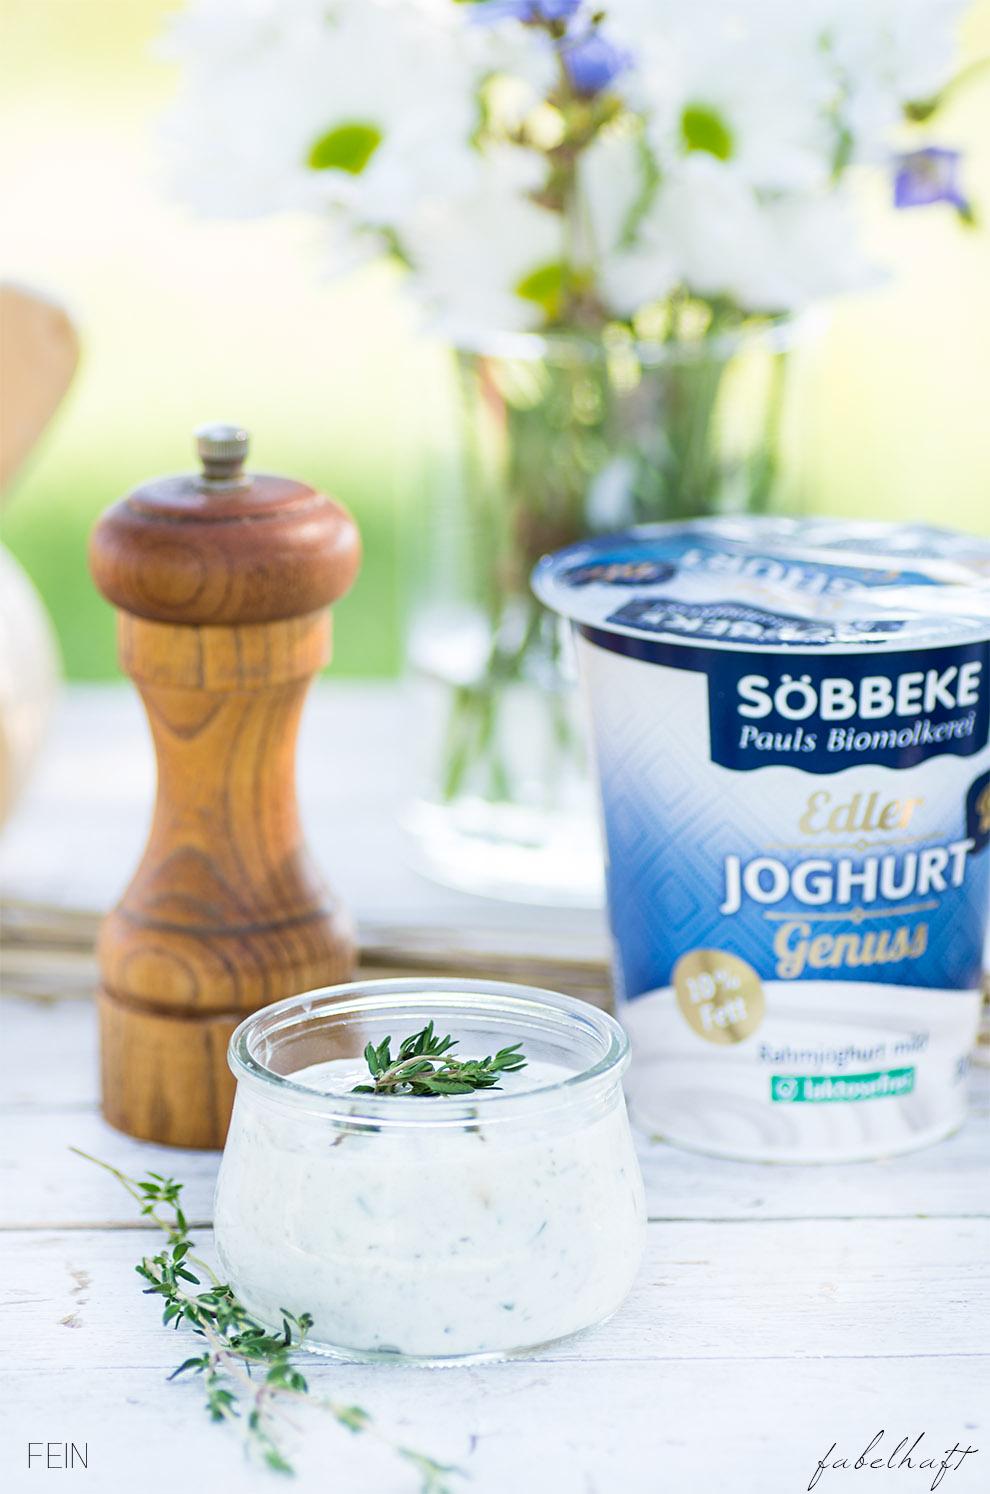 Joghurt Söbbeke Kräuter Dip